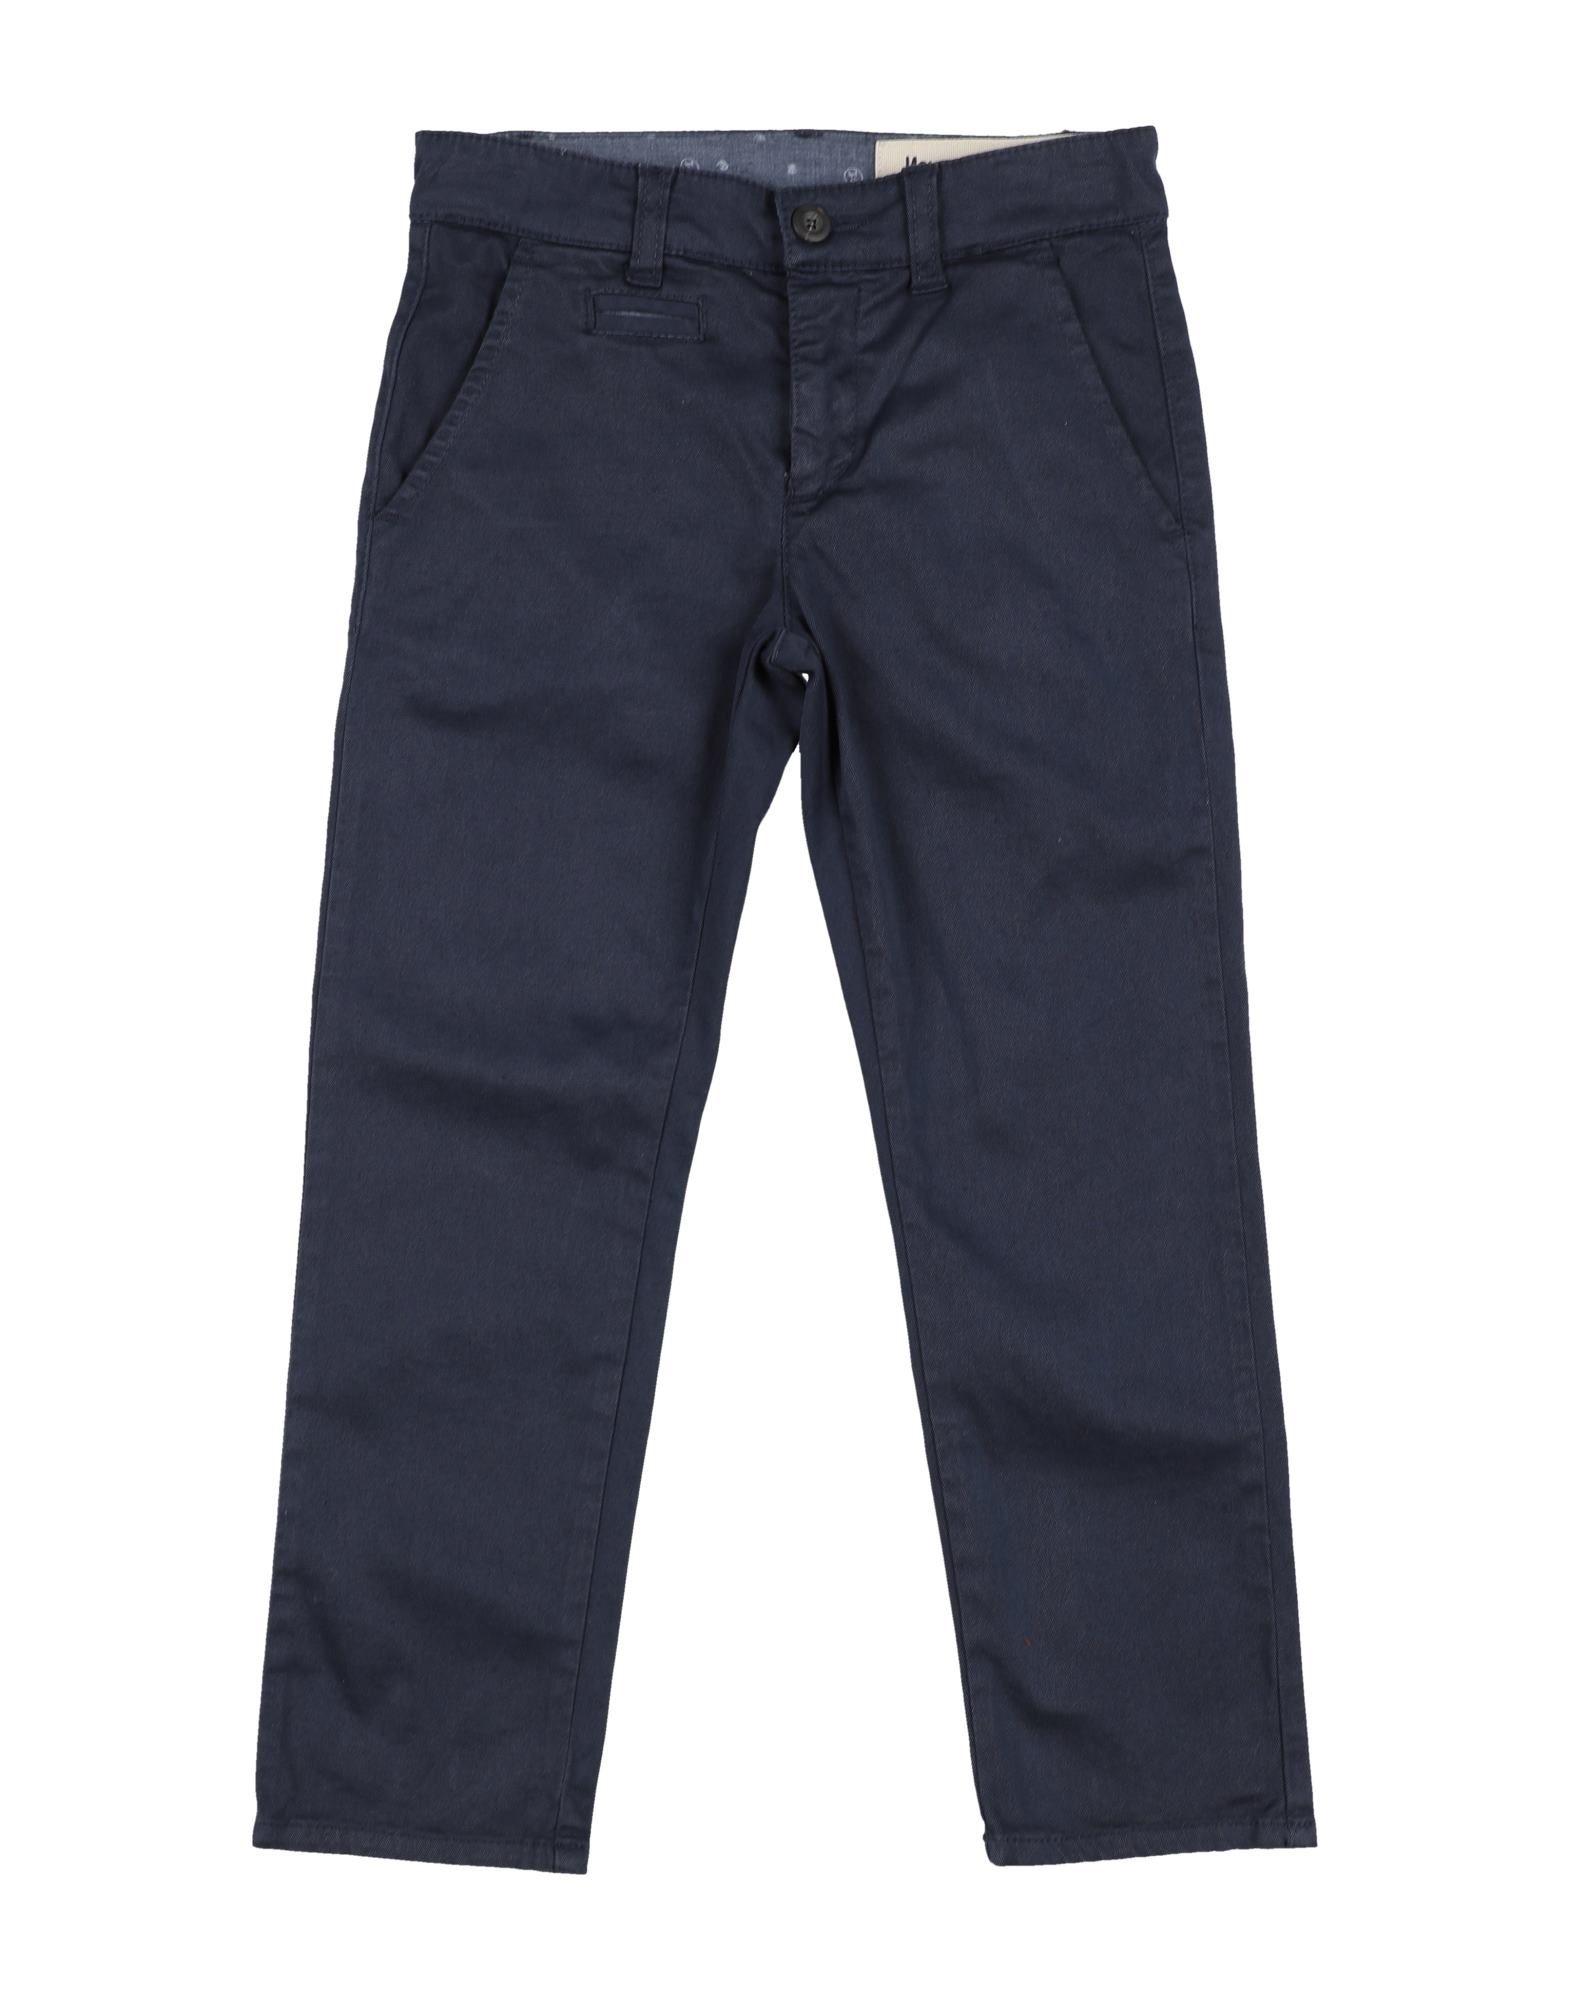 Novemb3r Kids' Casual Pants In Blue